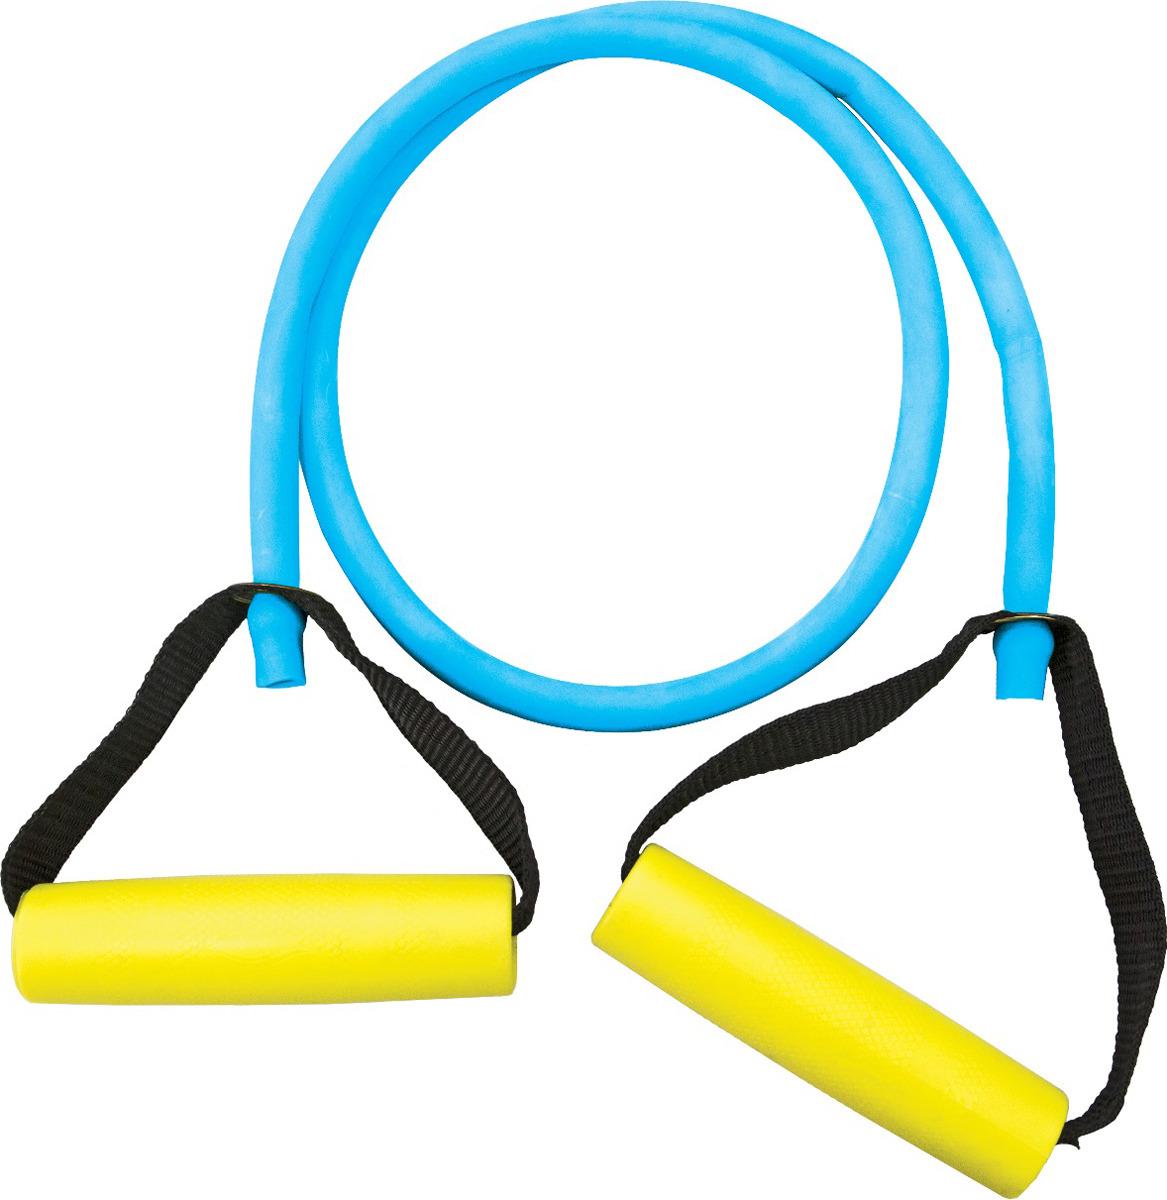 Эспандер Absolute Champion Т-2, 4690337034180, синий, для груди, 1 м эспандер absolute champion с разборной ручкой